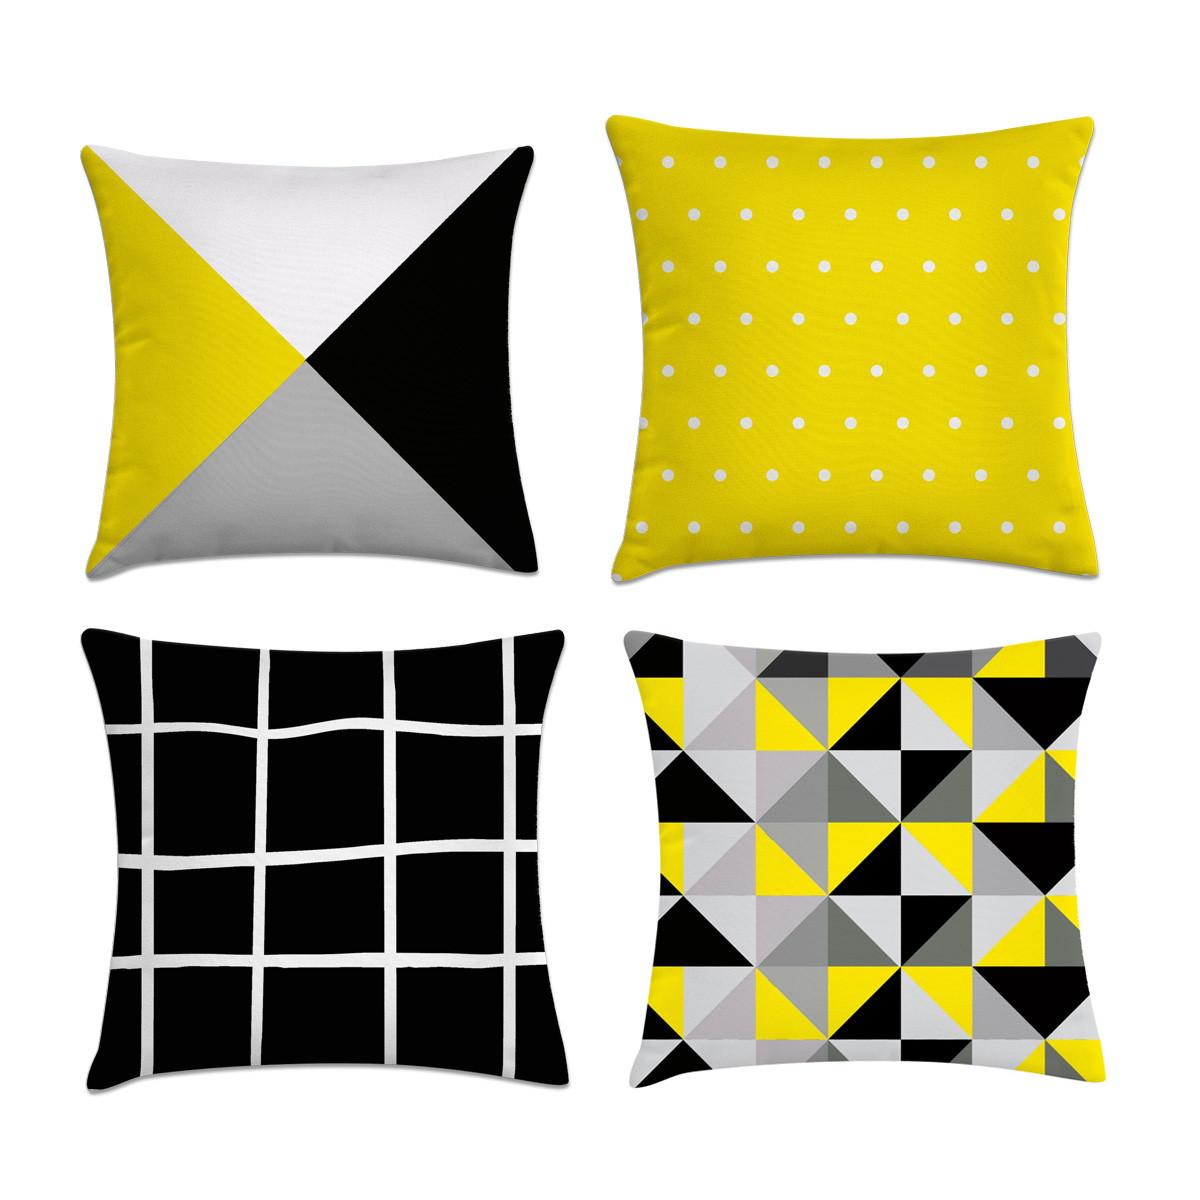 44877c316f03a0 Kit 4 capas de almofadas cinza amarelo e preto